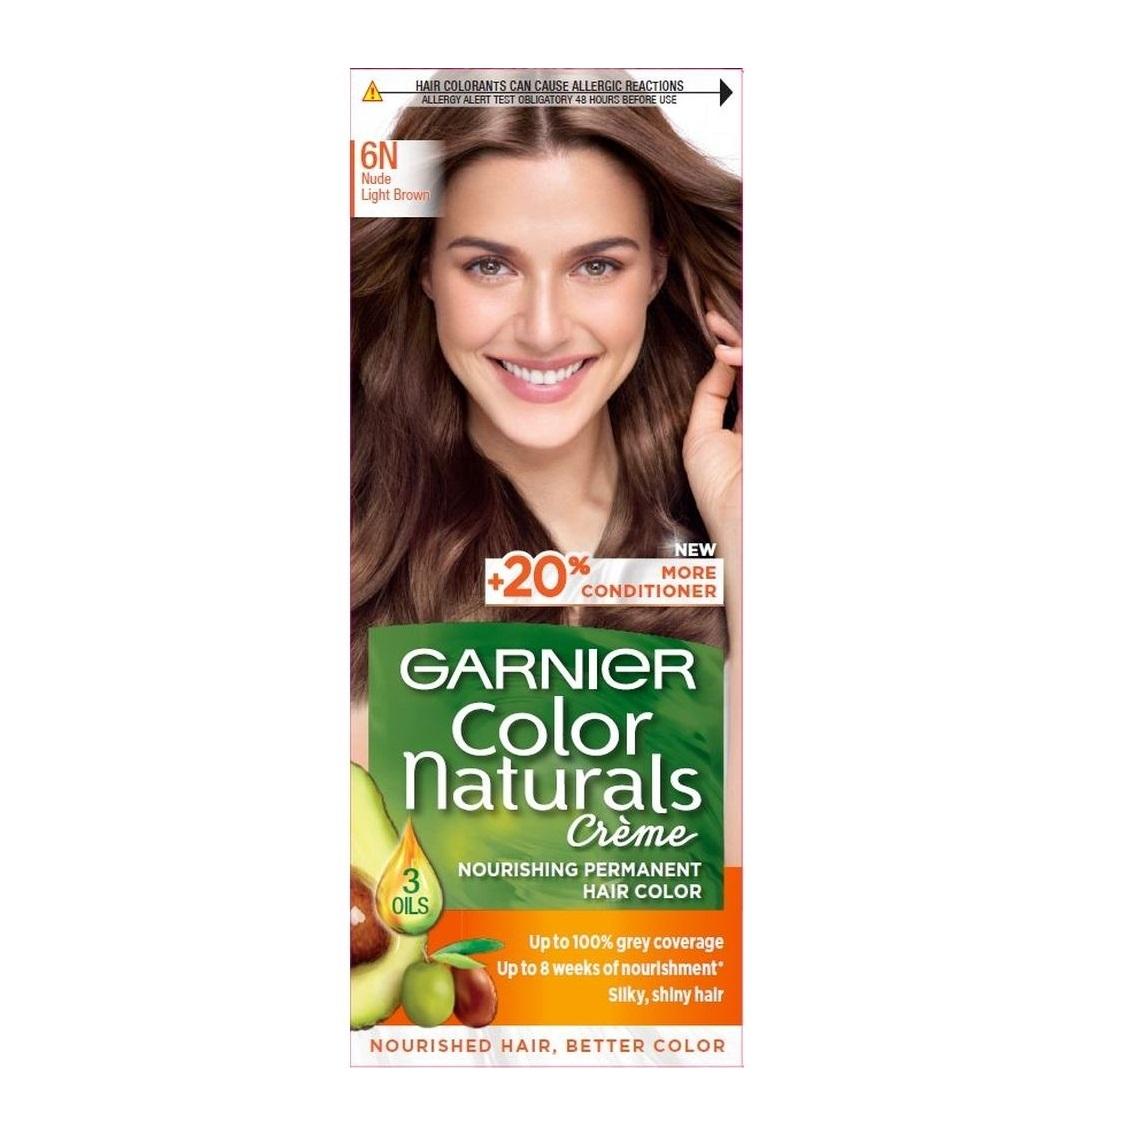 کیت رنگ مو گارنیر سری Color Naturals شماره 6N